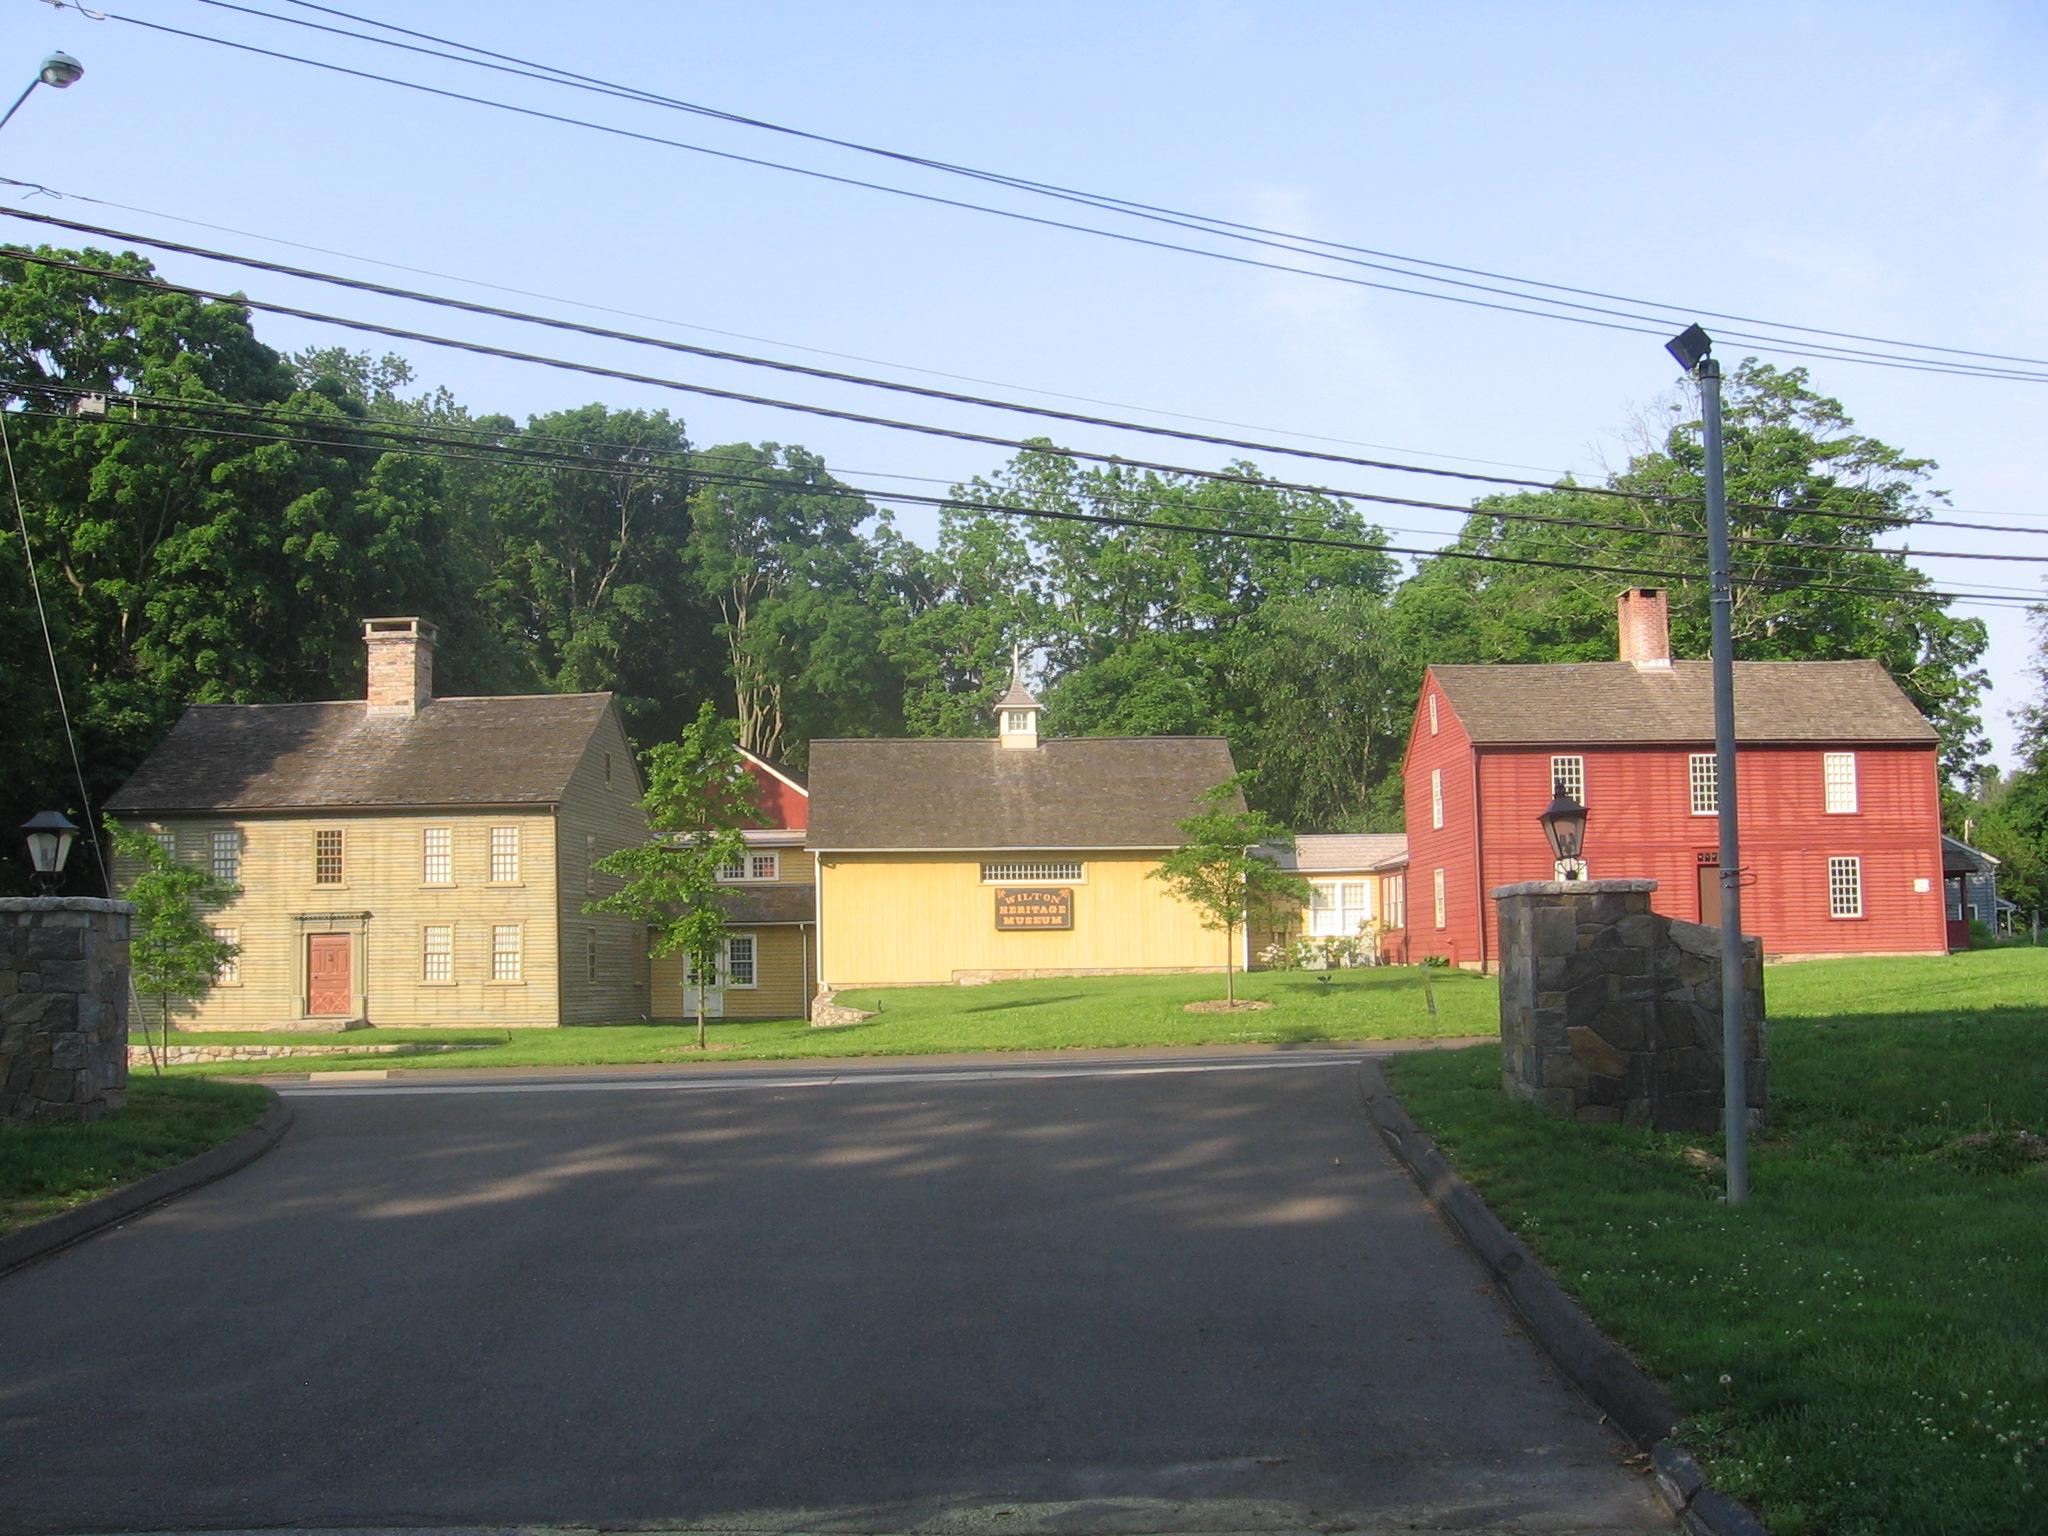 File:Wilton Historical Society 078 JPG - Wikimedia Commons